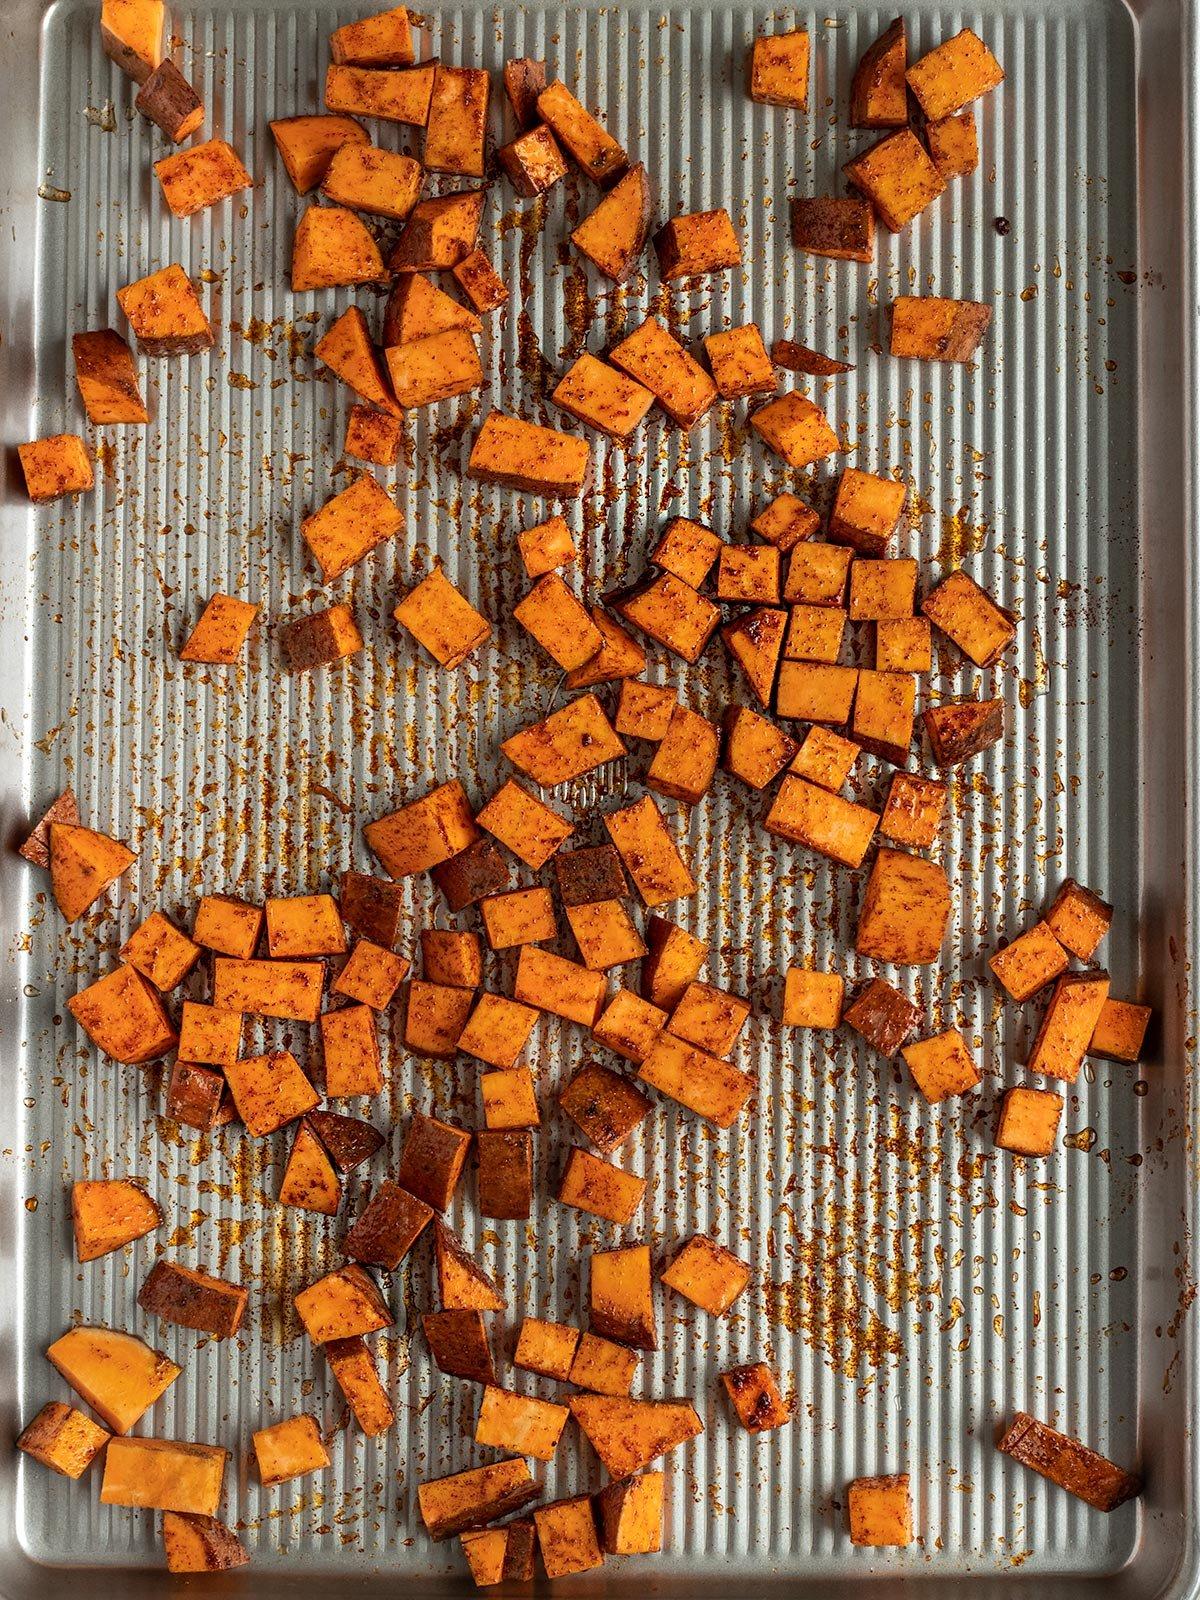 seasoned sweet potatoes on a baking tray before roasting